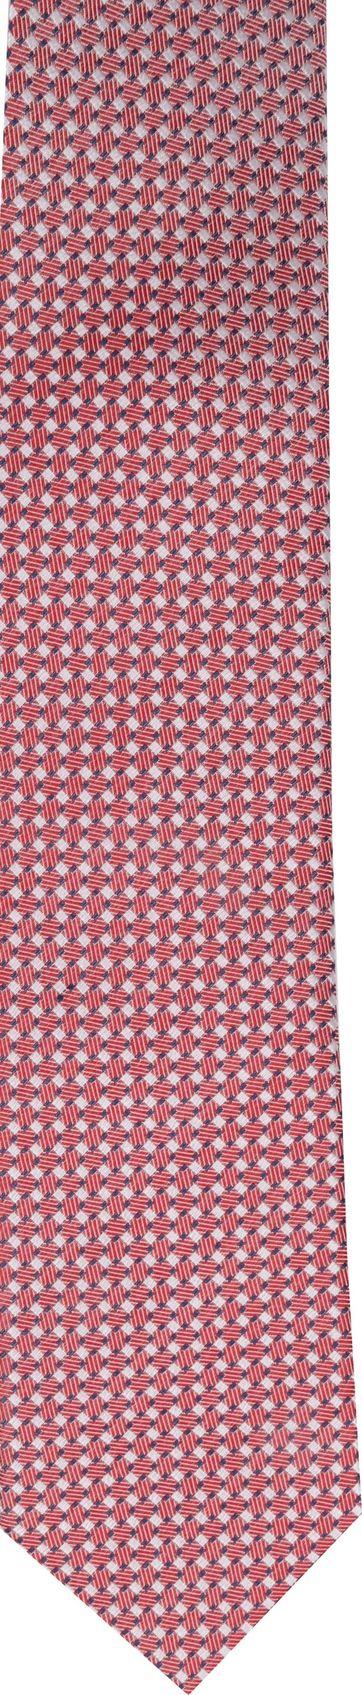 Suitable Krawatte Rot F01-21